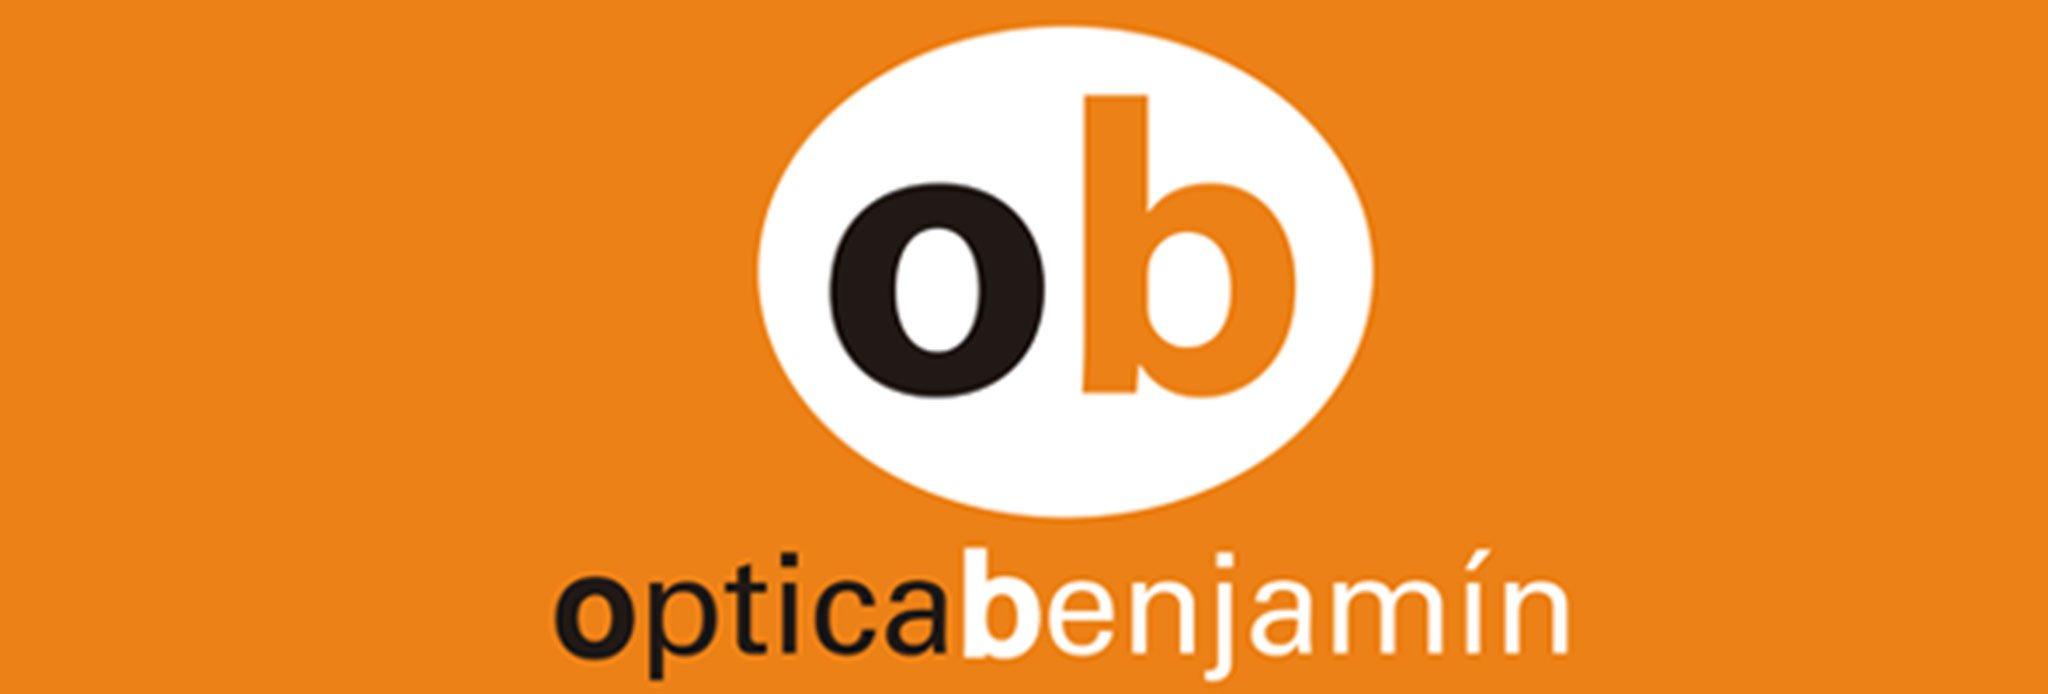 Óptica Benjamín's logo